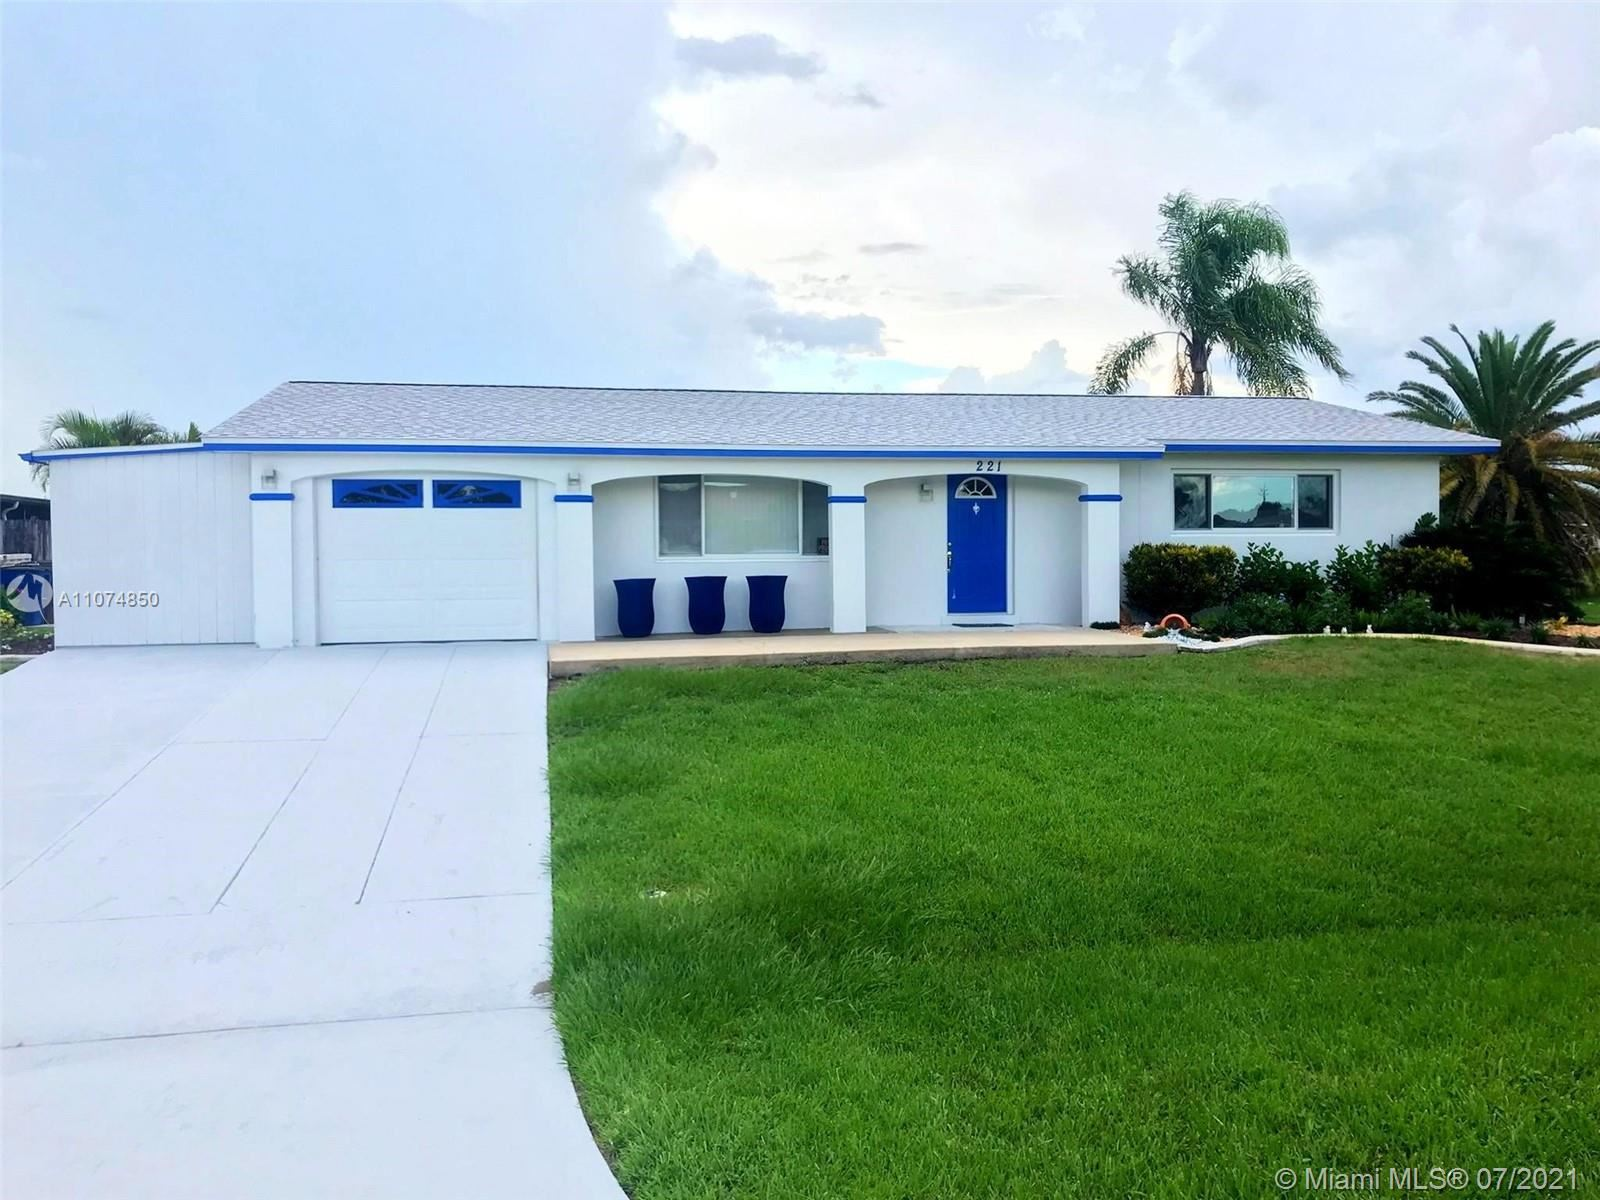 221 Redcliff, Lehigh Acres, FL 33936 - #: A11074850